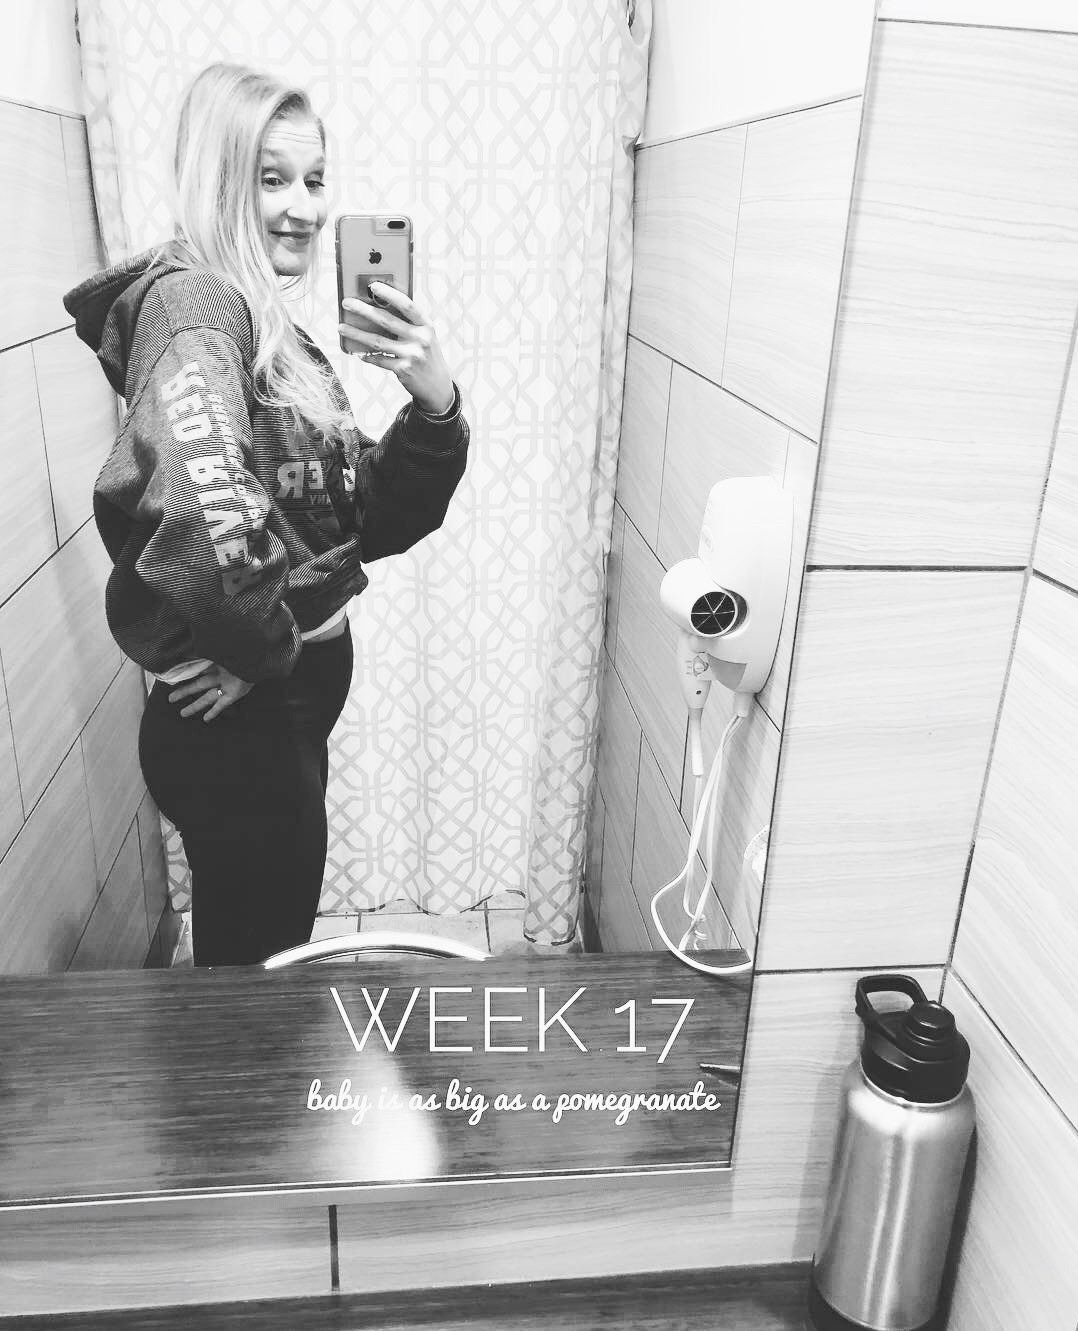 Week 17 - Sandi Mele pregnancy